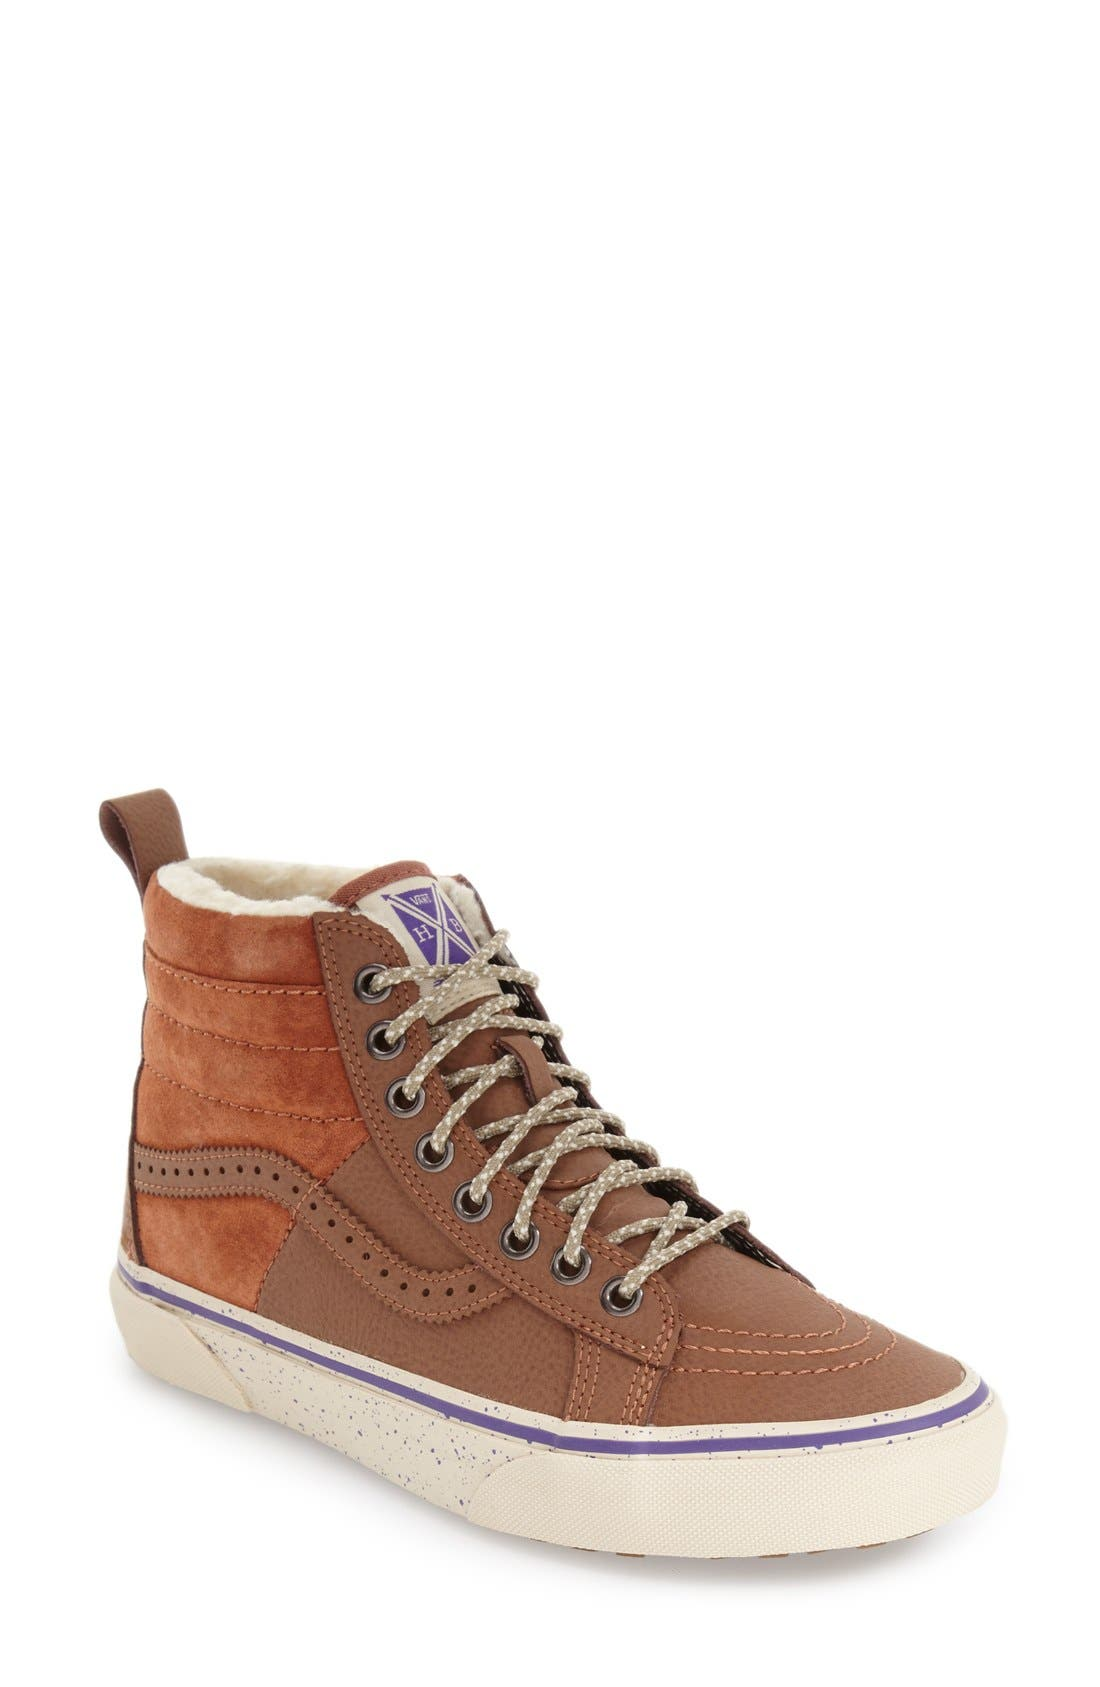 Vans Hana Beaman – SK8-Hi 46 MTE Water Resistant Sneaker (Women)